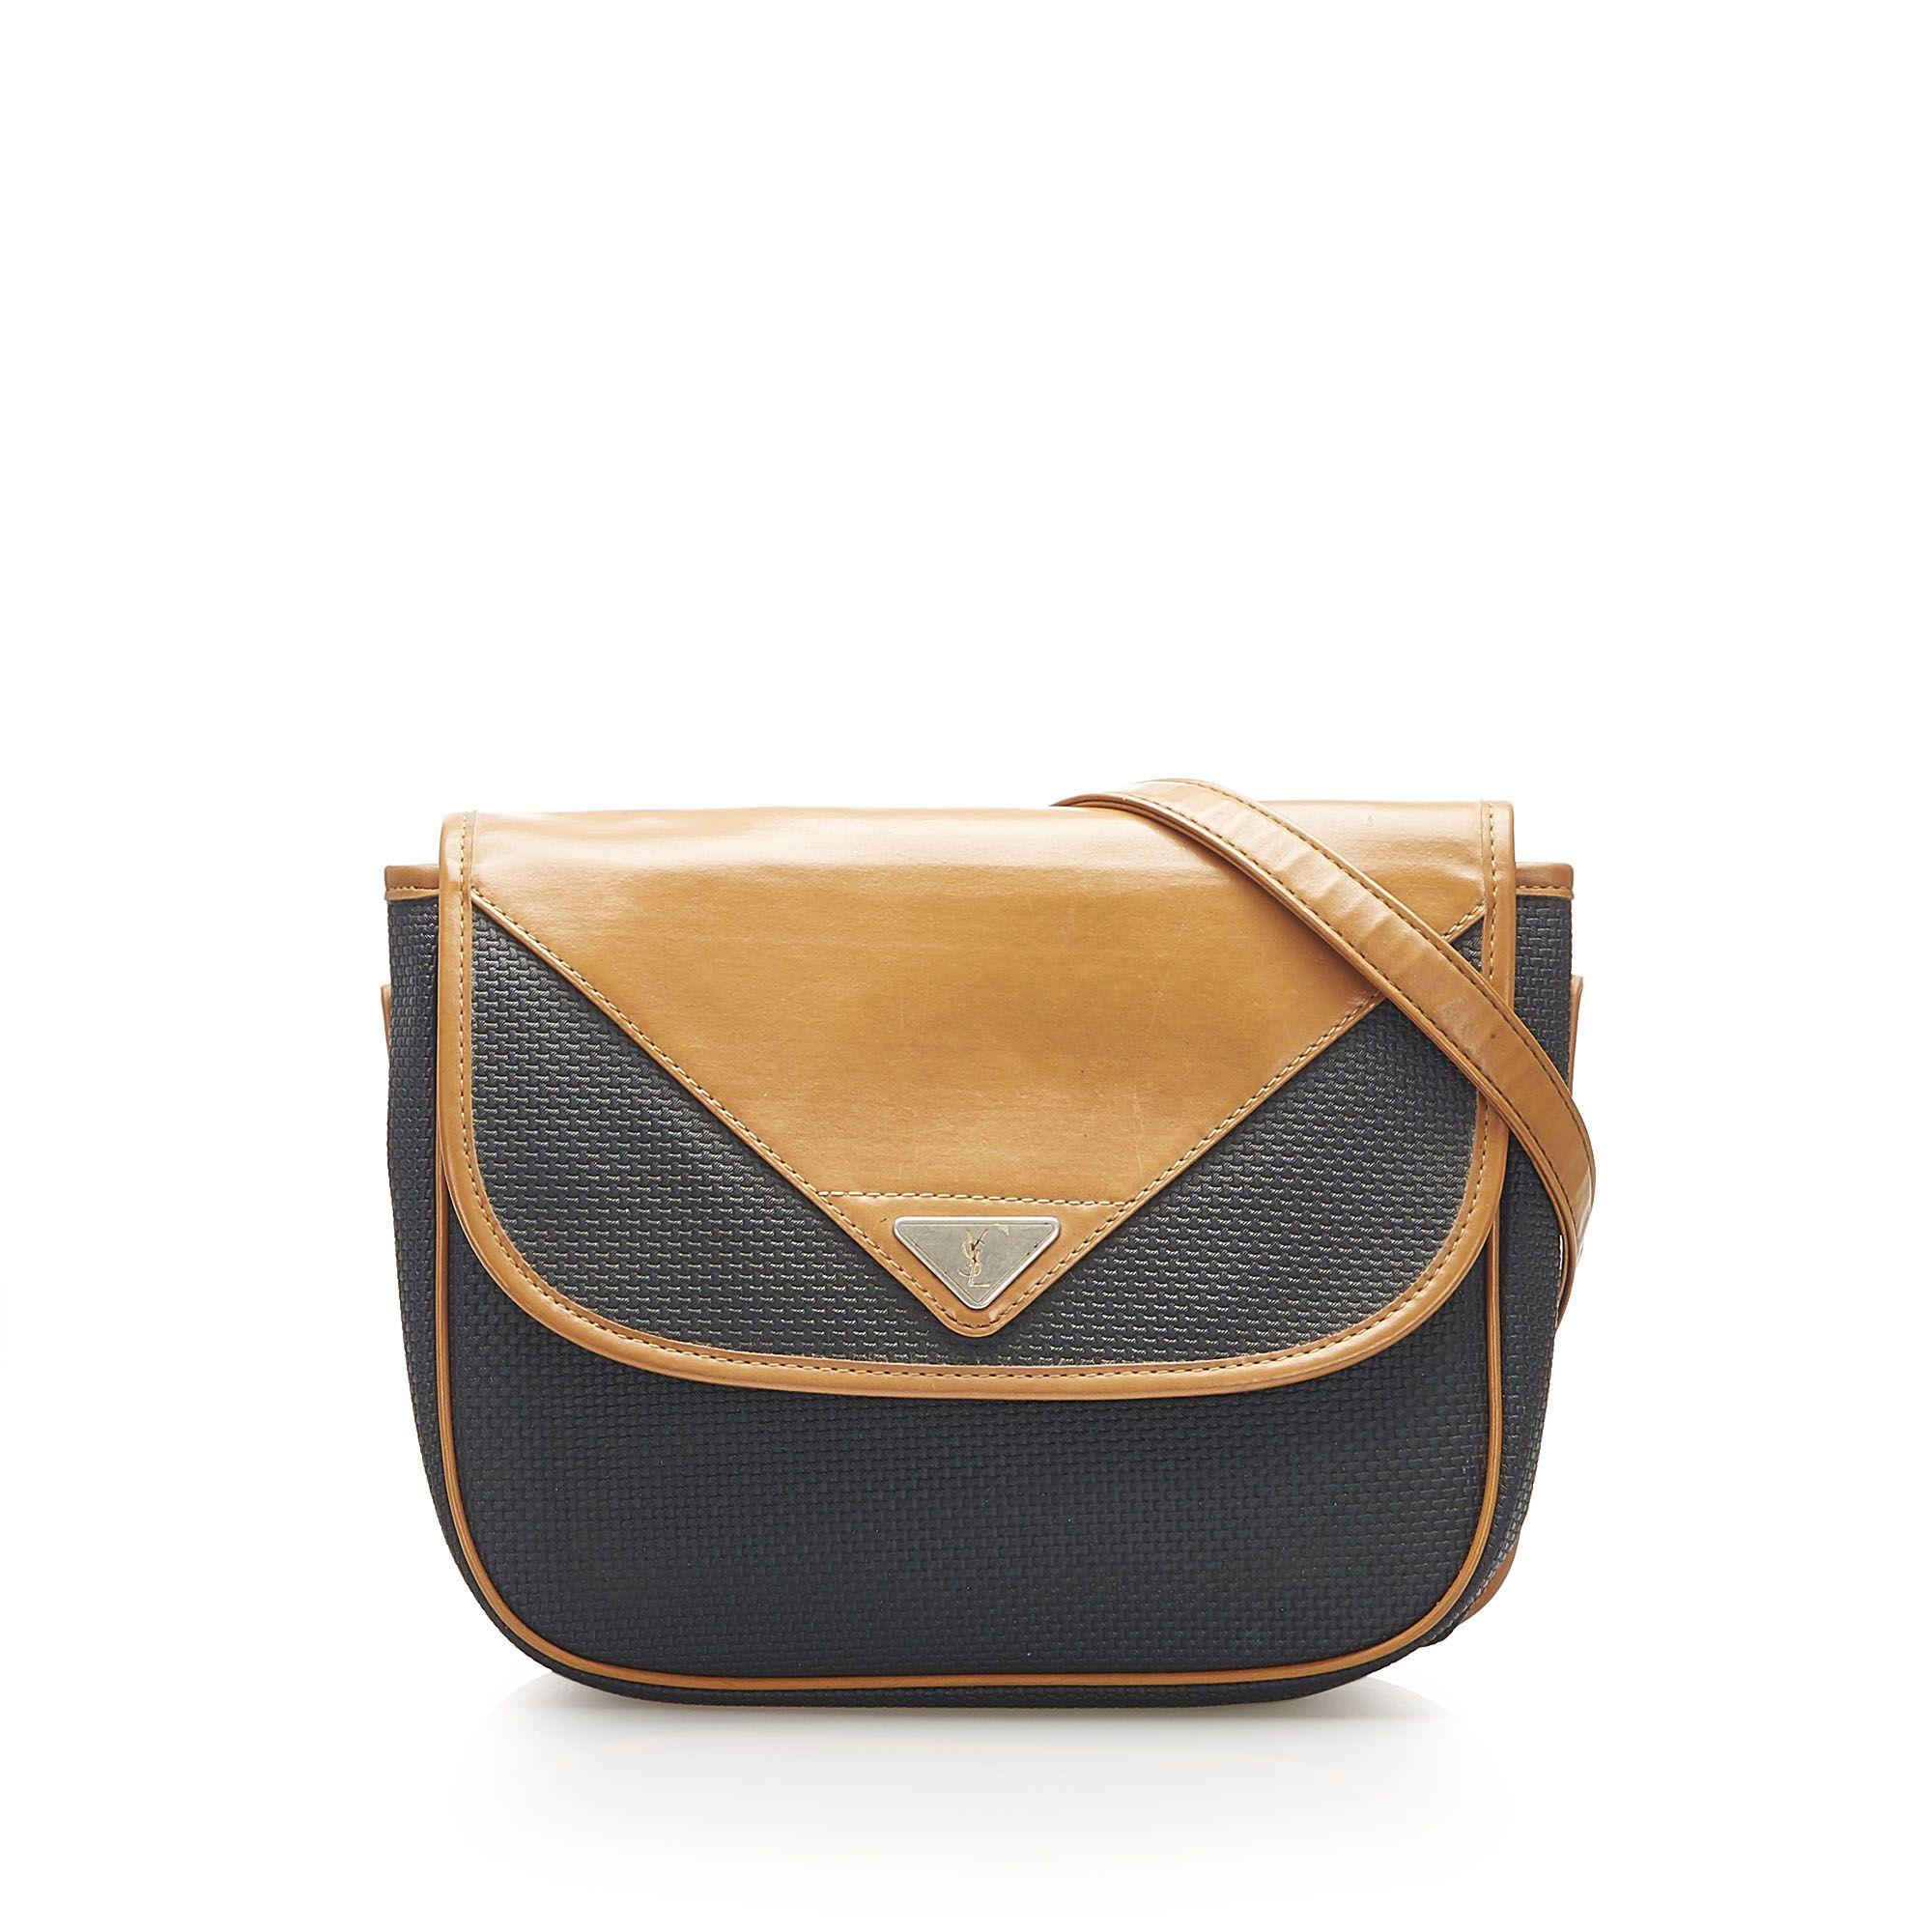 Vintage YSL Leather Crossbody Bag Brown